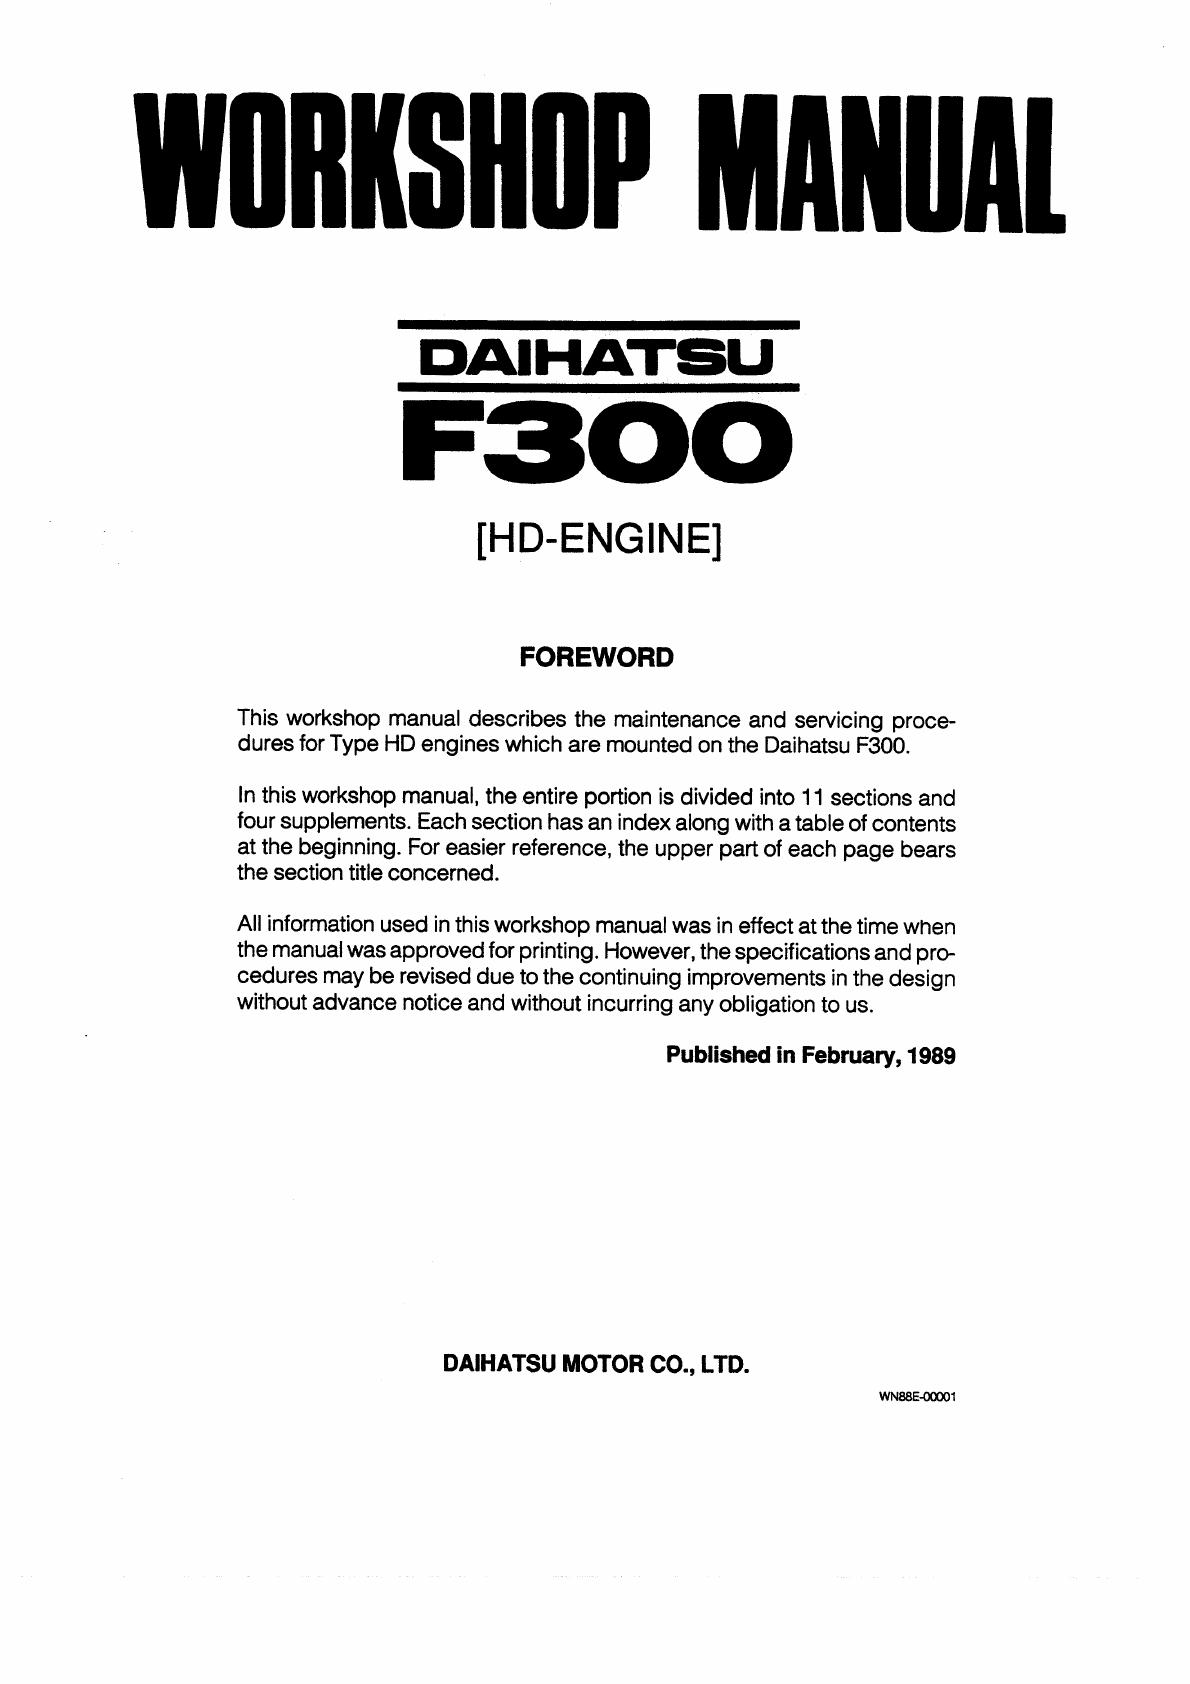 daihatsu 327 engine manual product user guide instruction u2022 rh mekatta co residential electrical wiring diagrams [ 1190 x 1684 Pixel ]